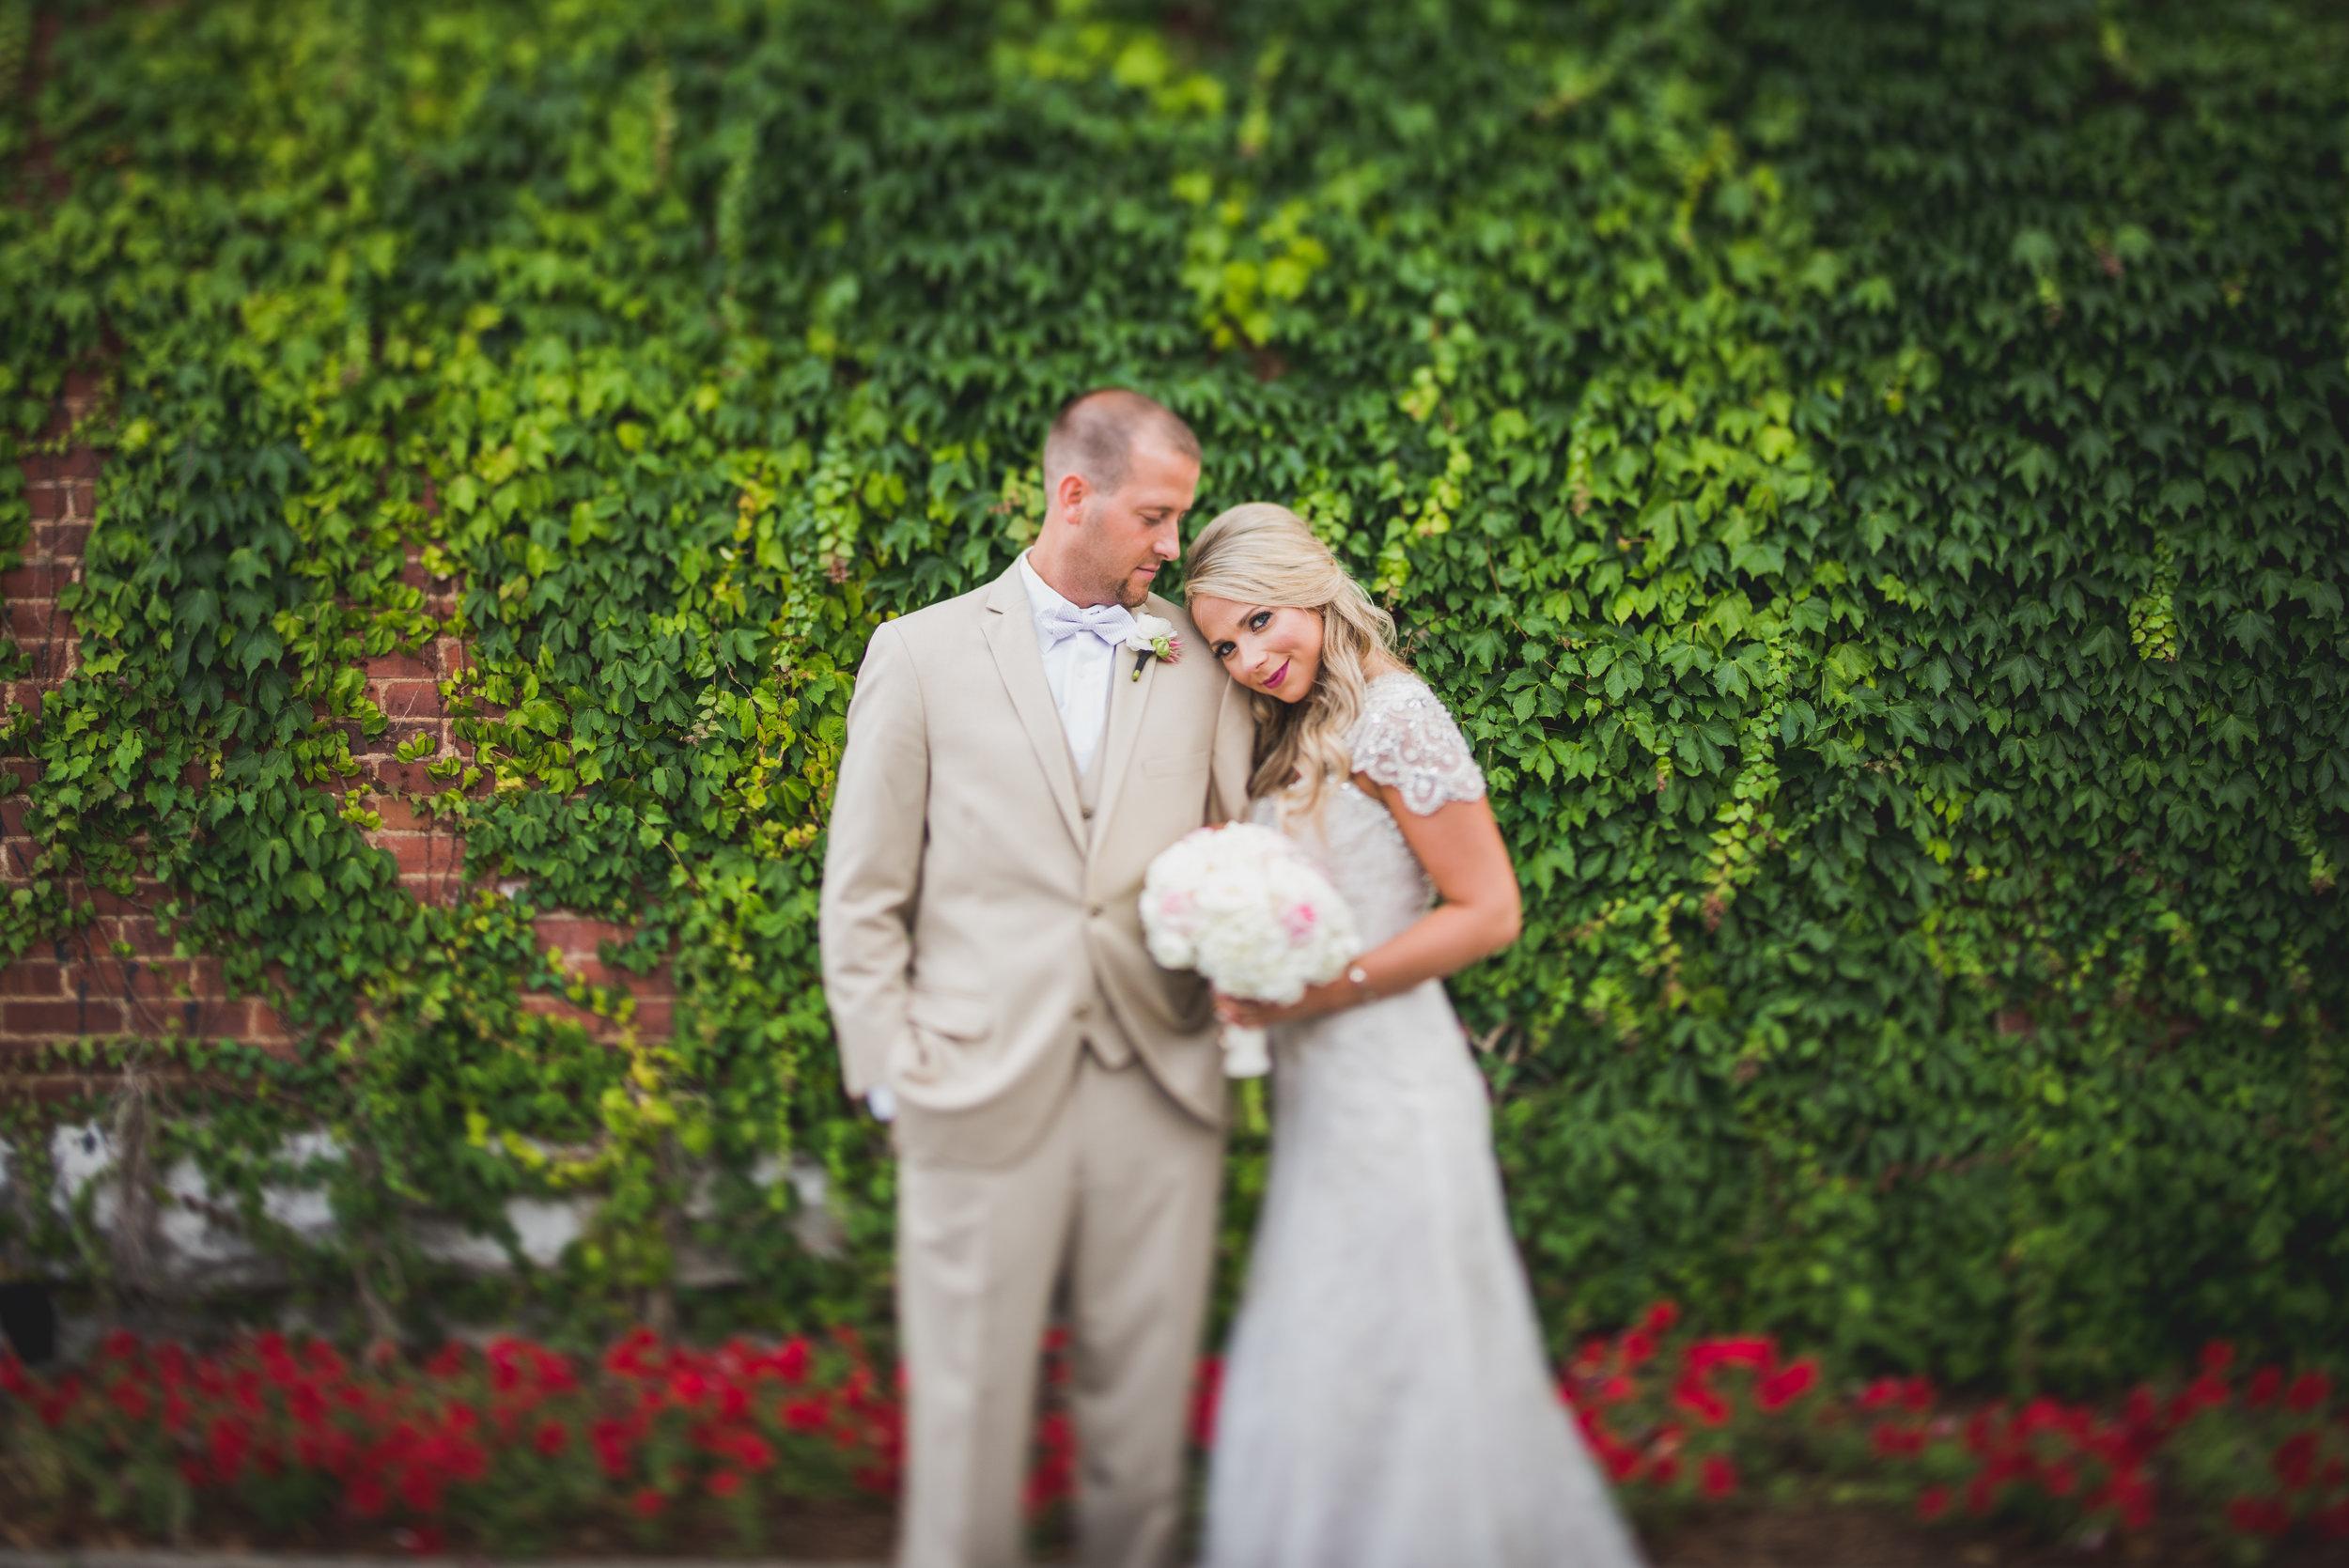 Nashville-Wedding-Photographer-Favorites162.jpg